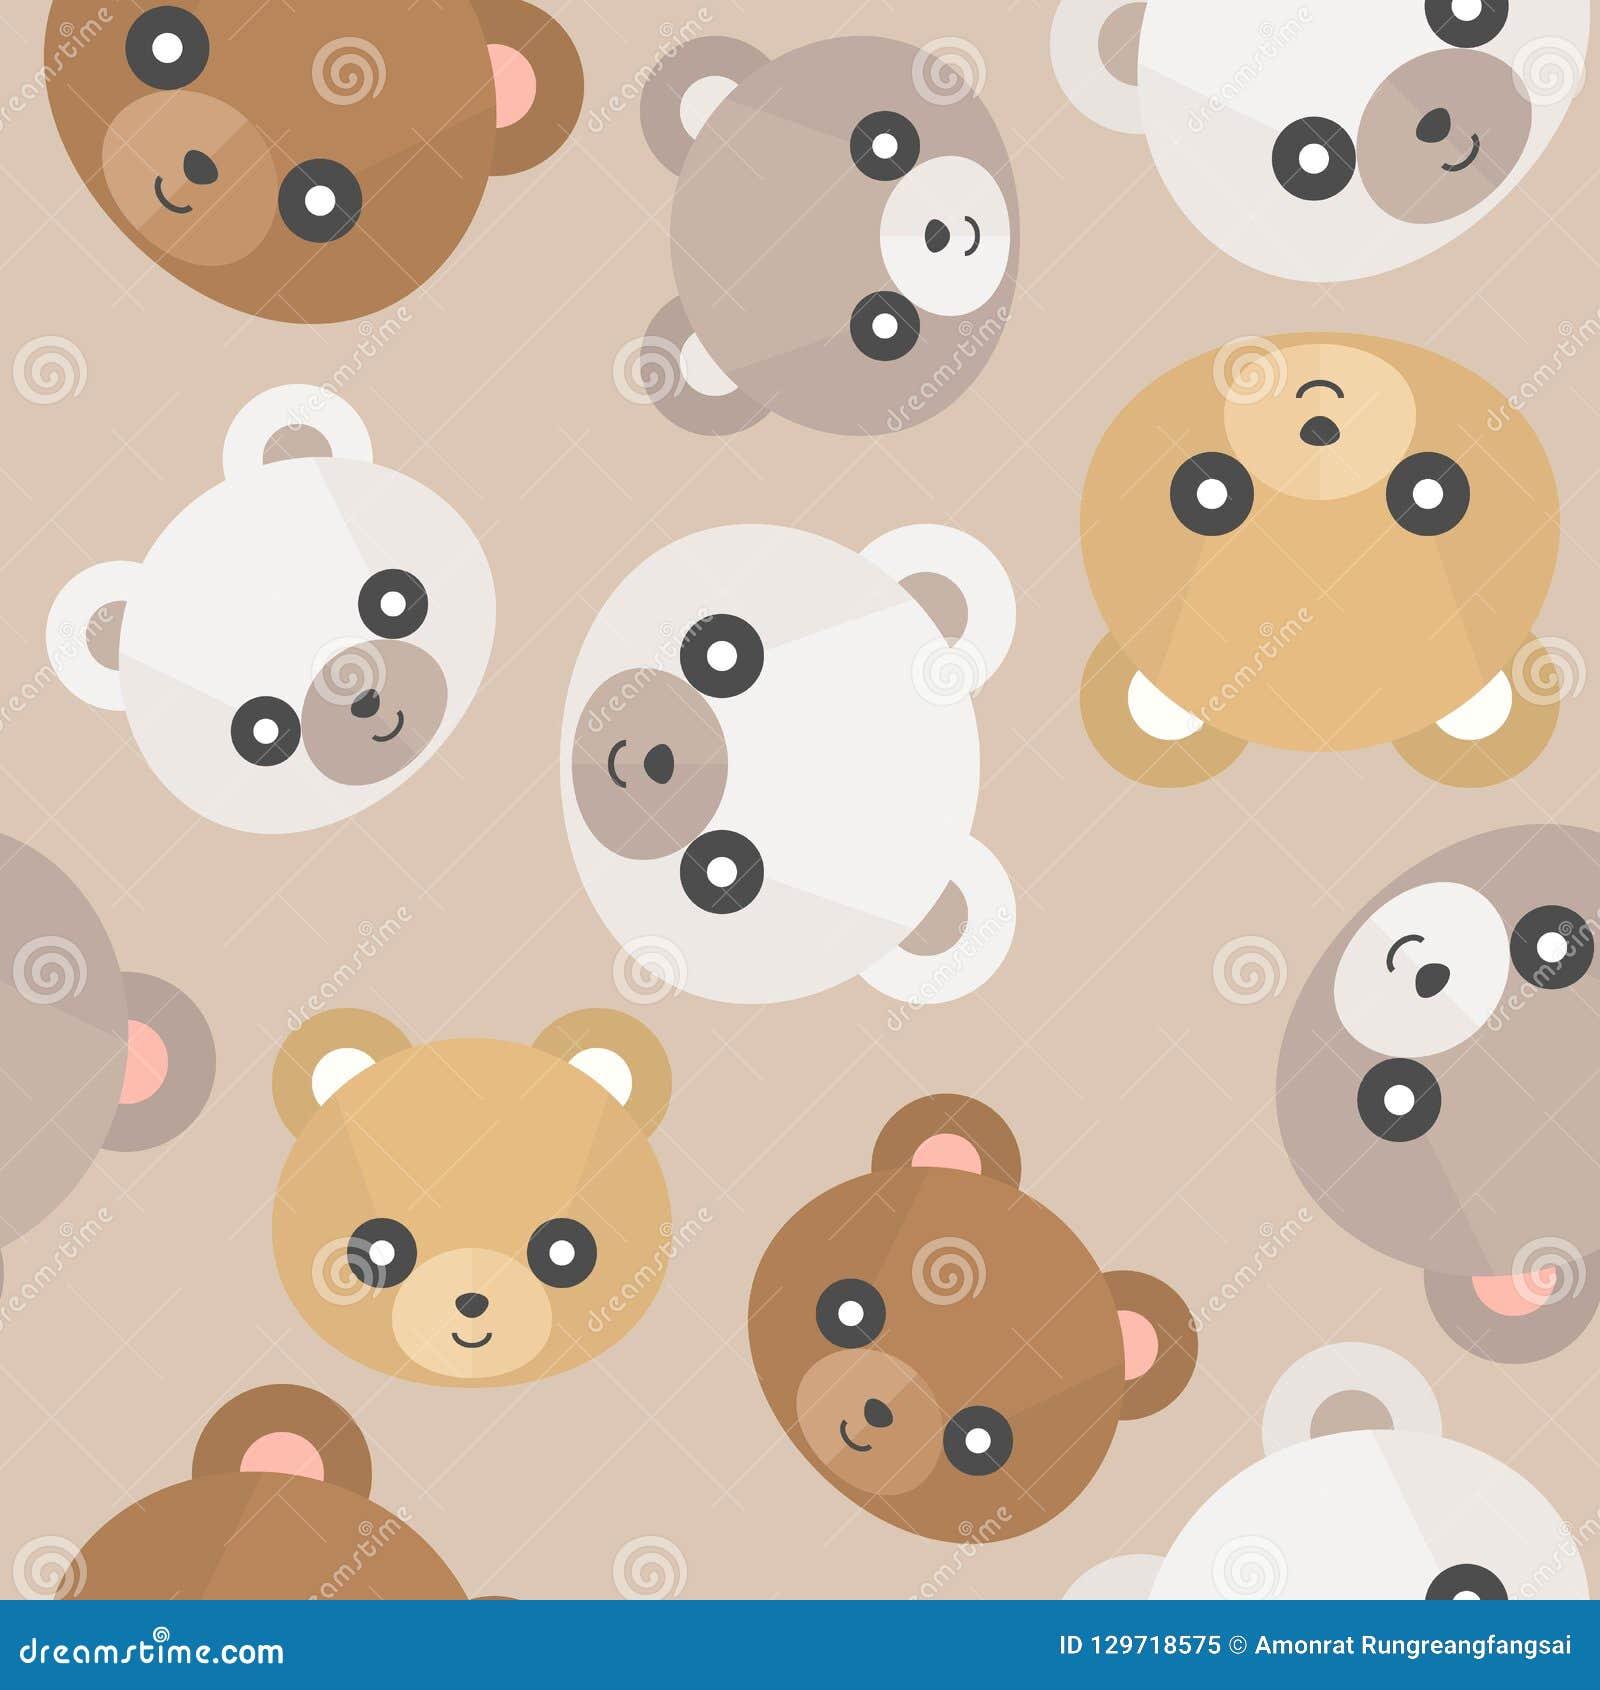 Free Vector | Teddy bear face head badge concept